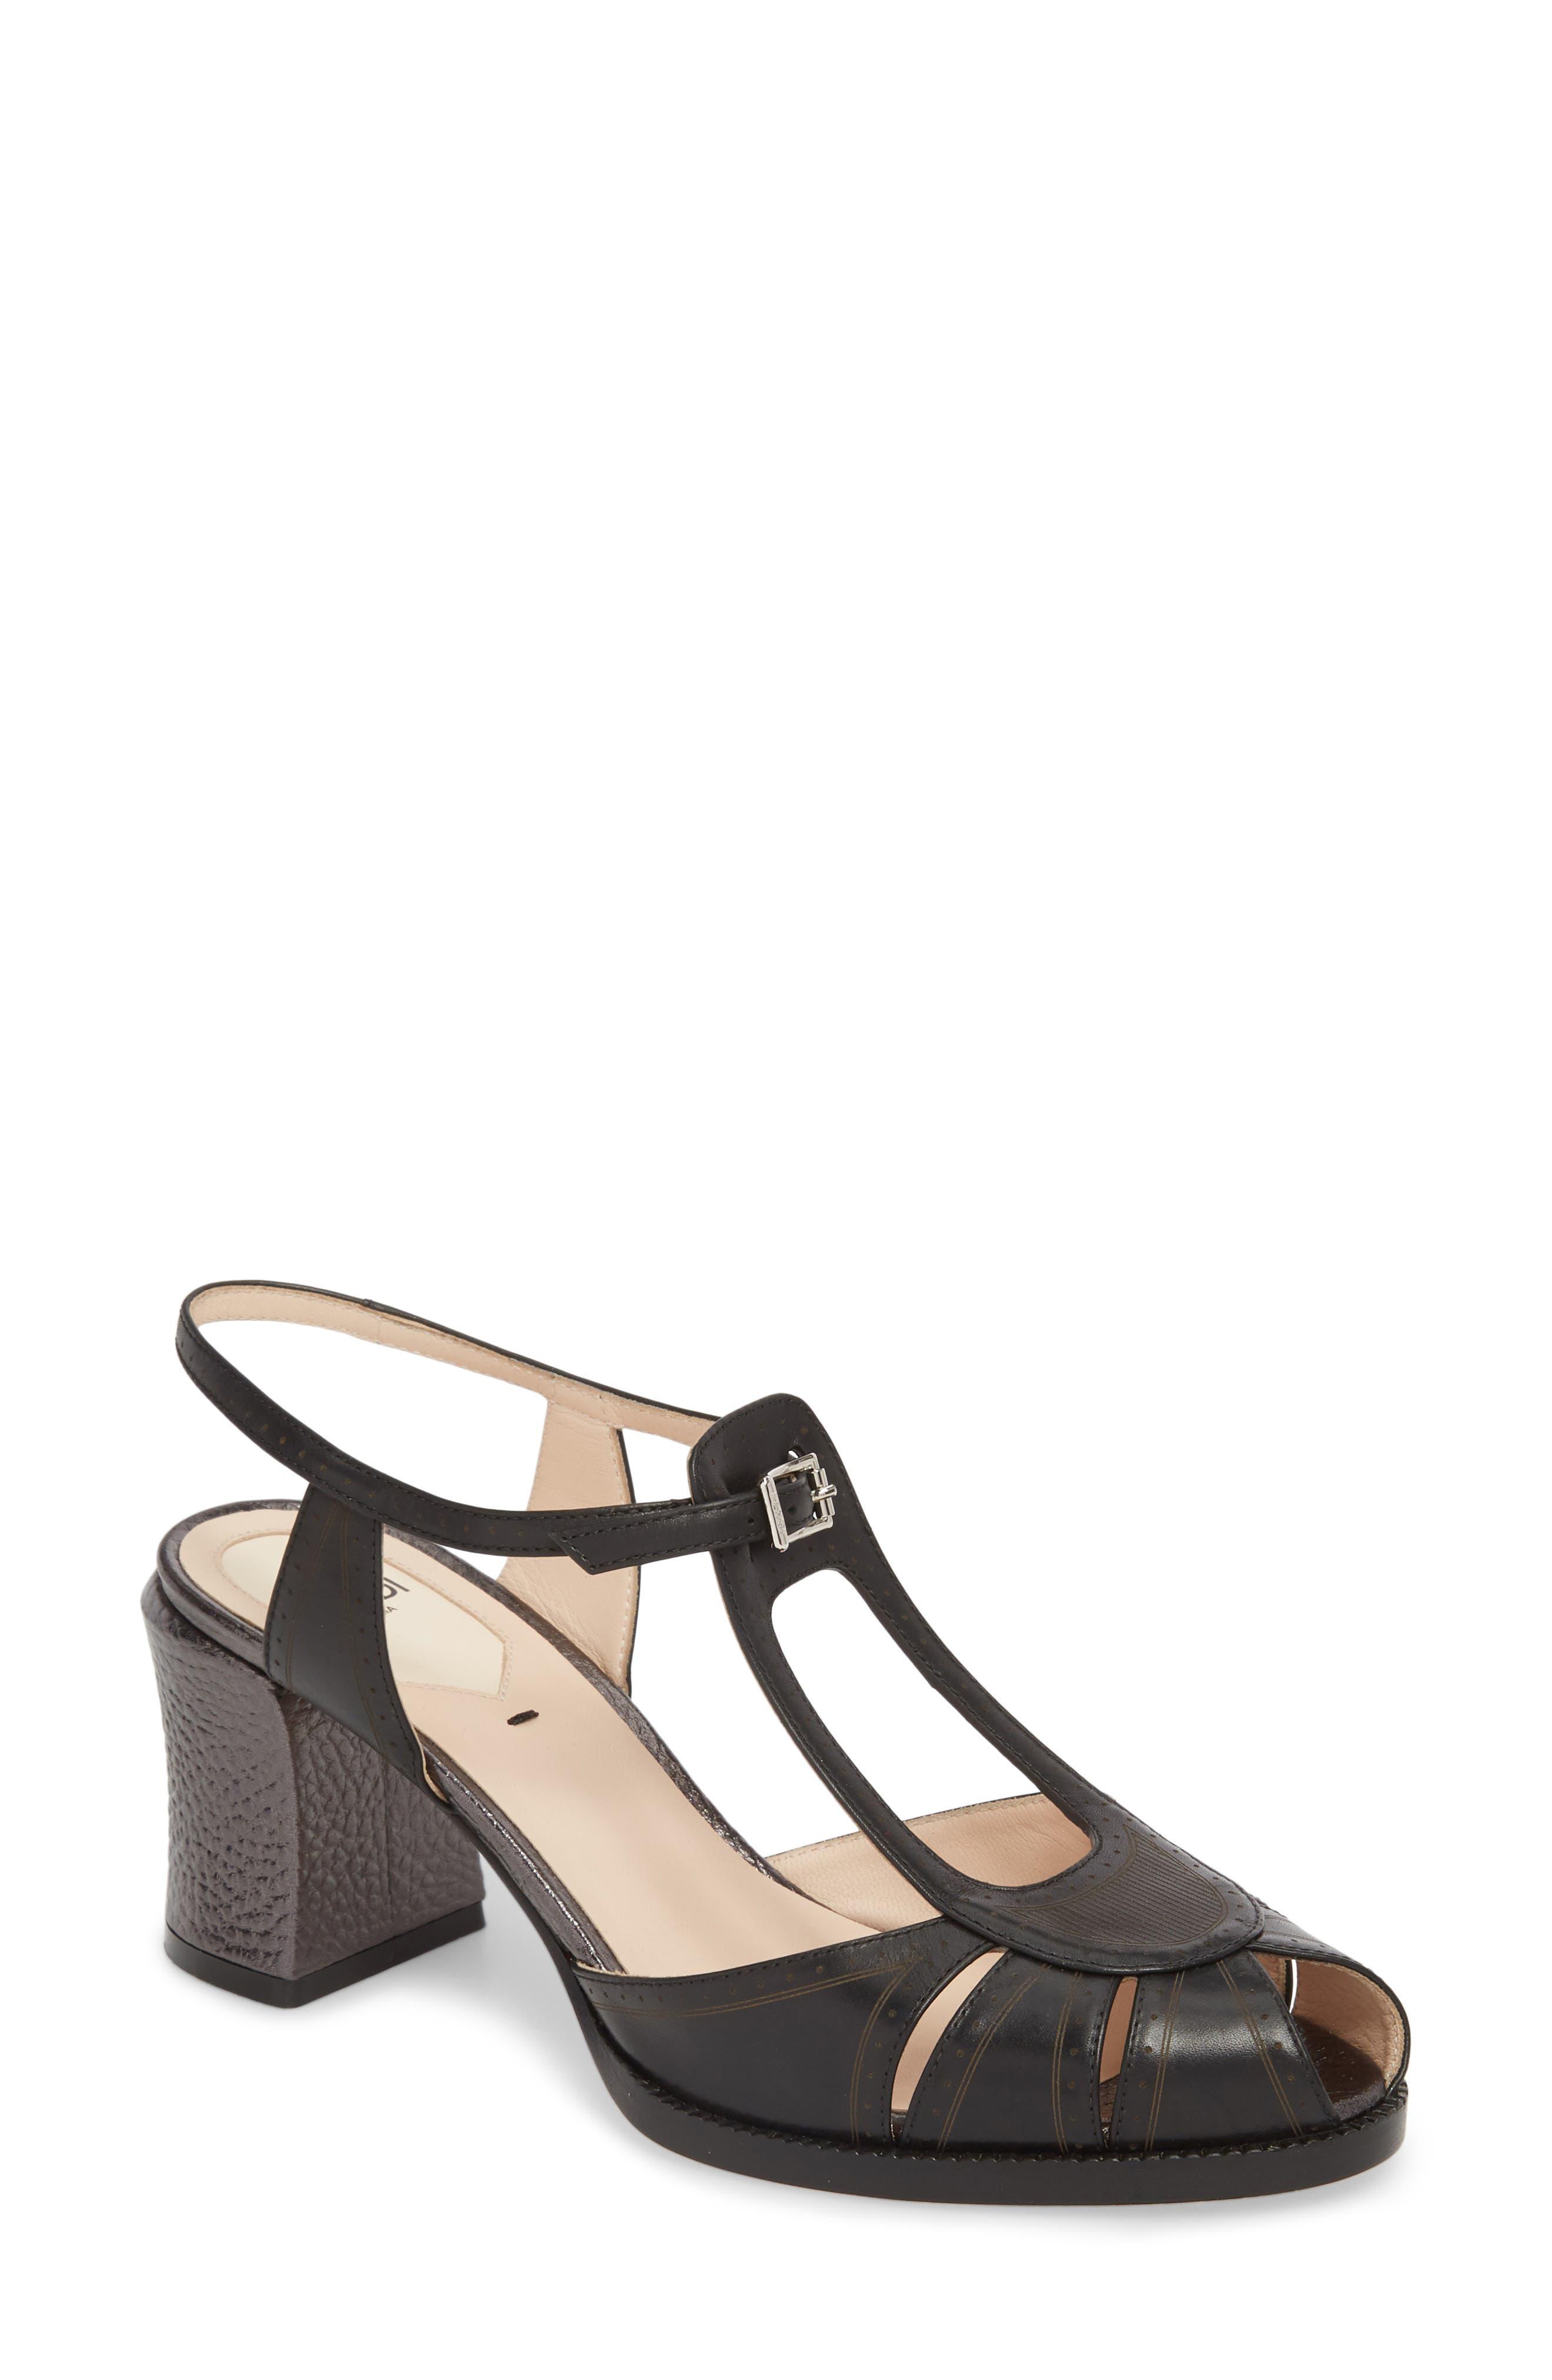 Chameleon Block Heel Sandal,                             Main thumbnail 1, color,                             019